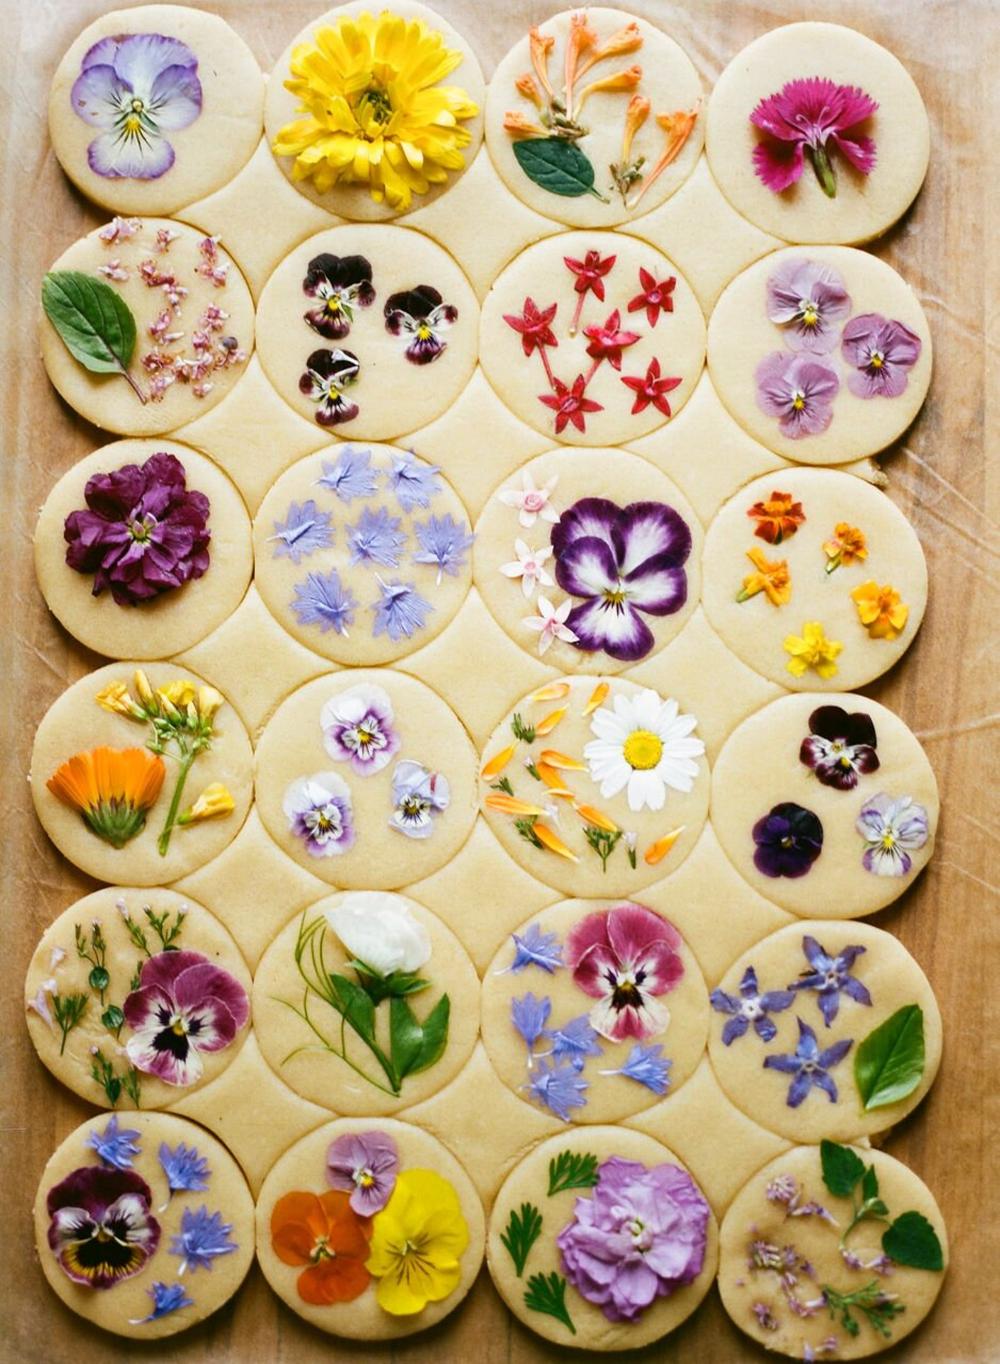 Original Flower Pressed Shortbread Cookies- 100% Organic